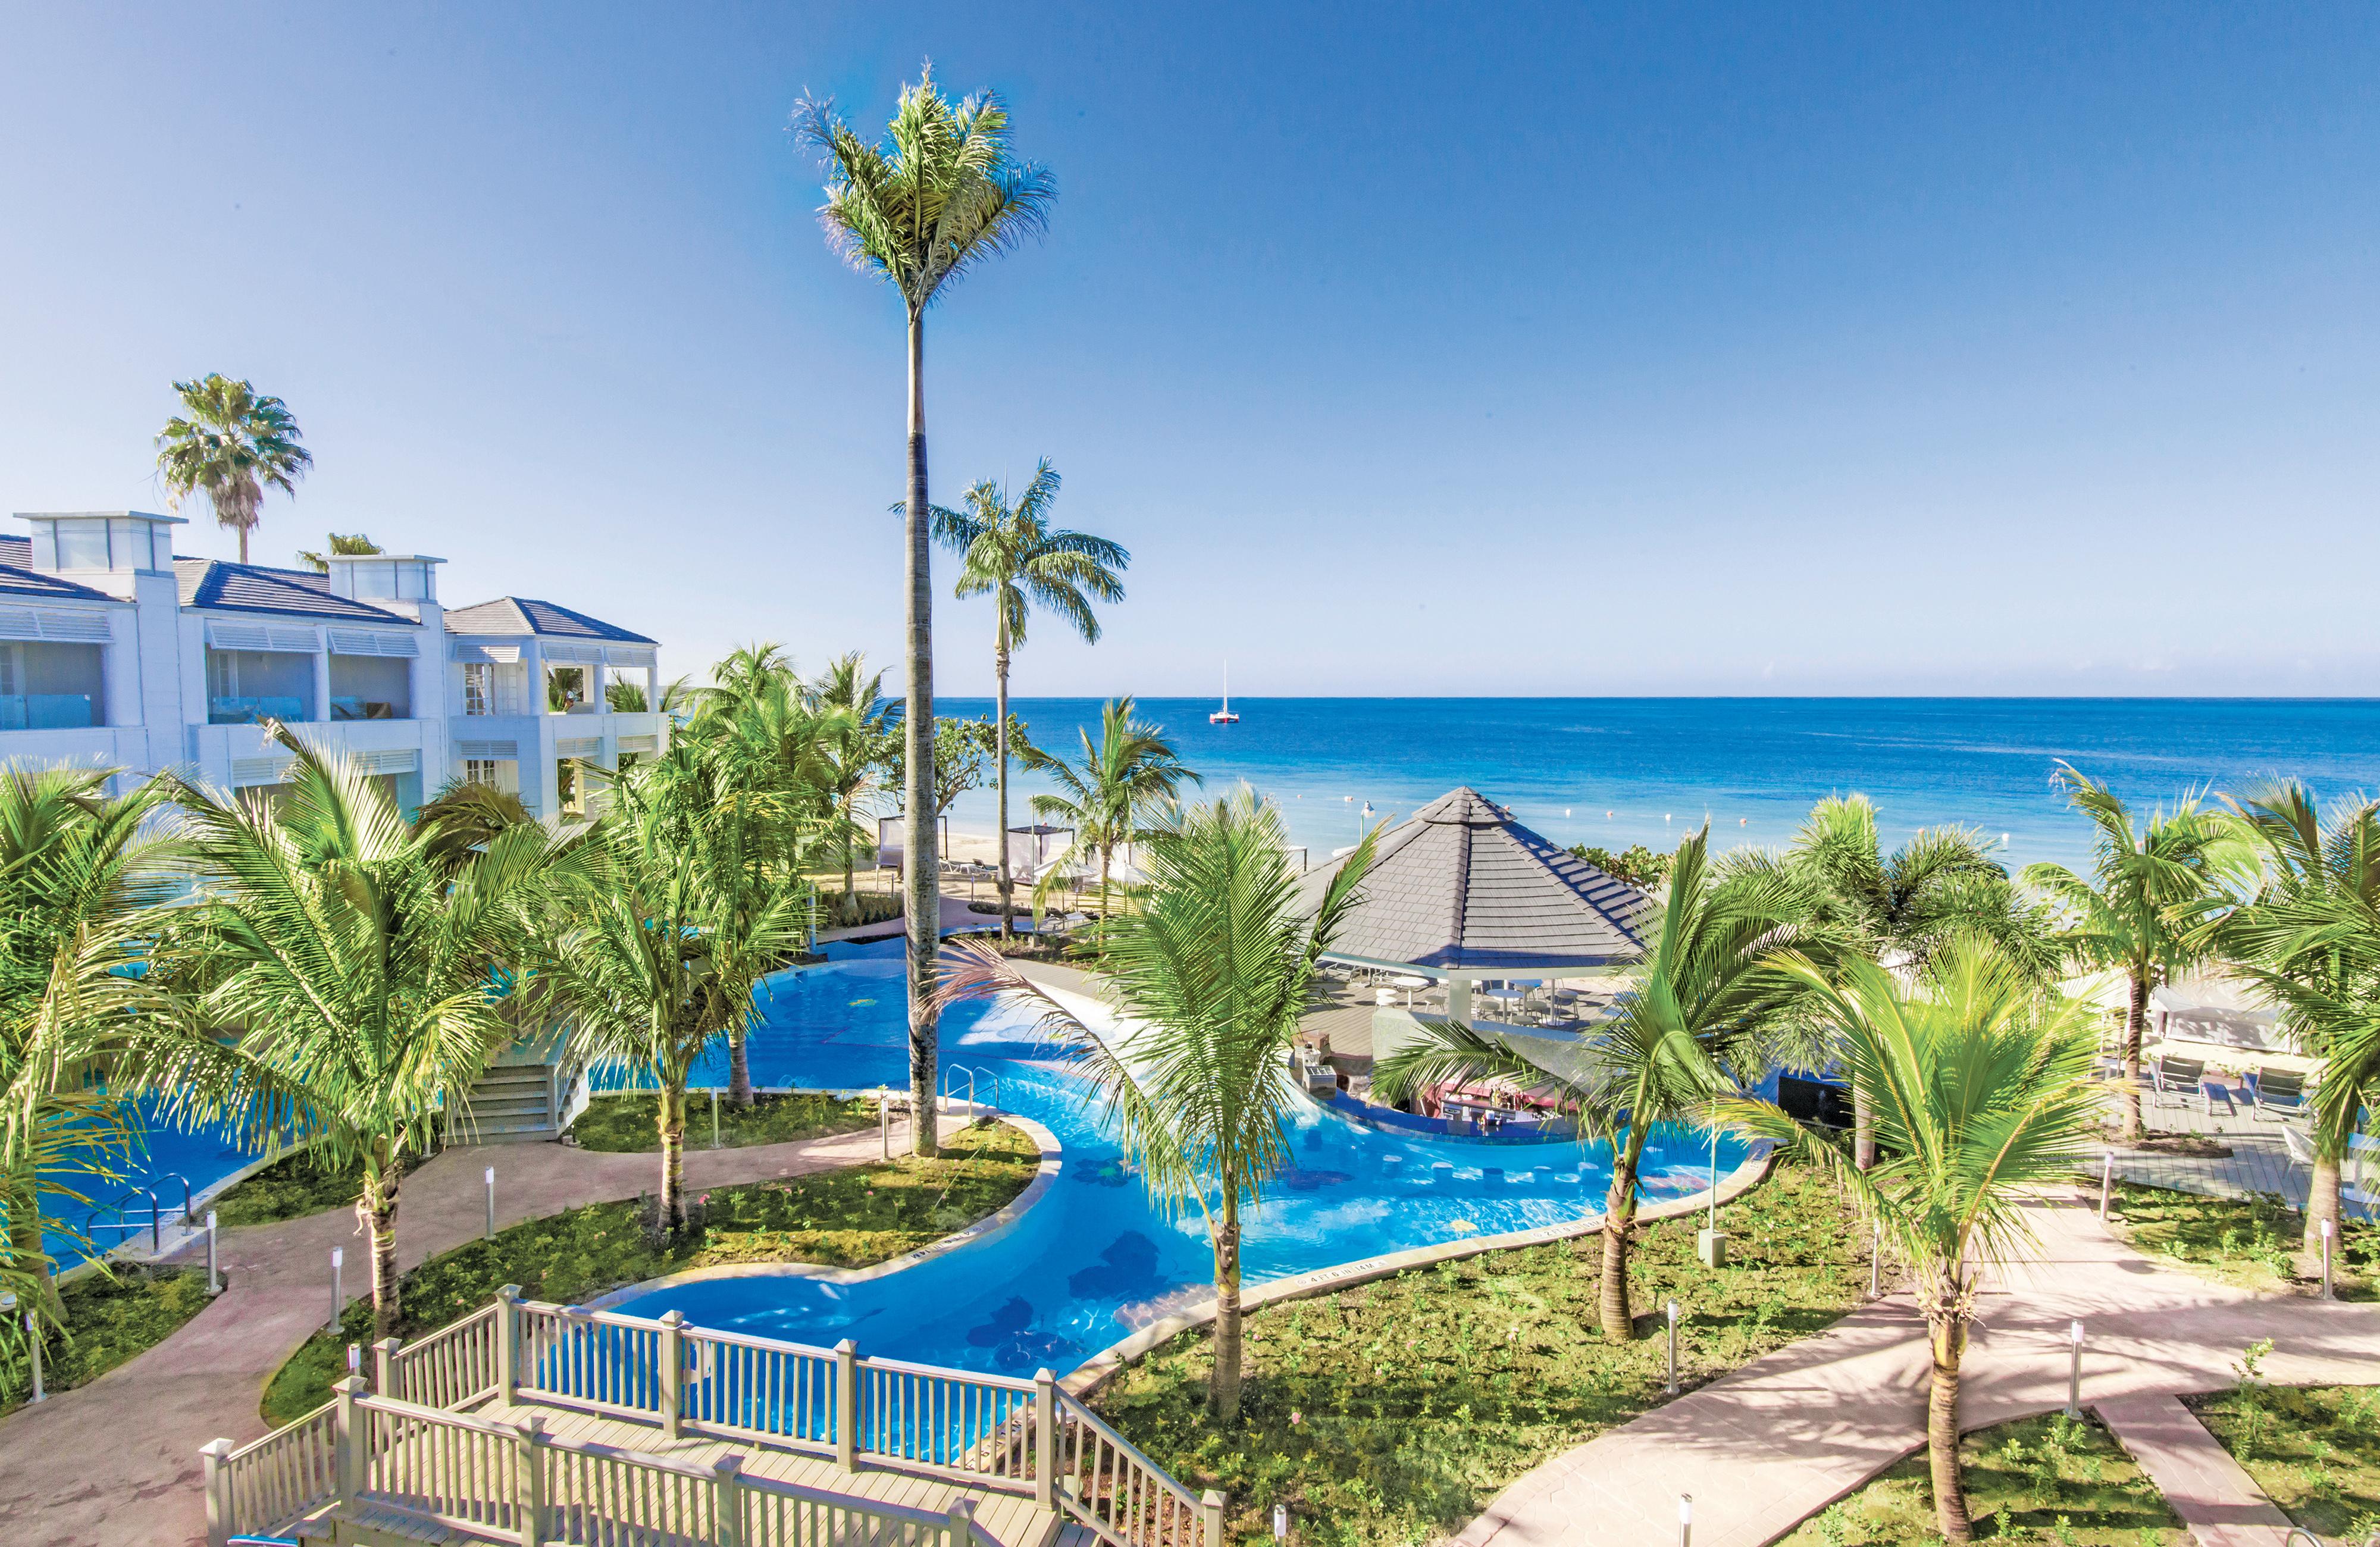 Travel Agency All-Inclusive Resort Azul Beach Resort Sensatori Jamaica 03